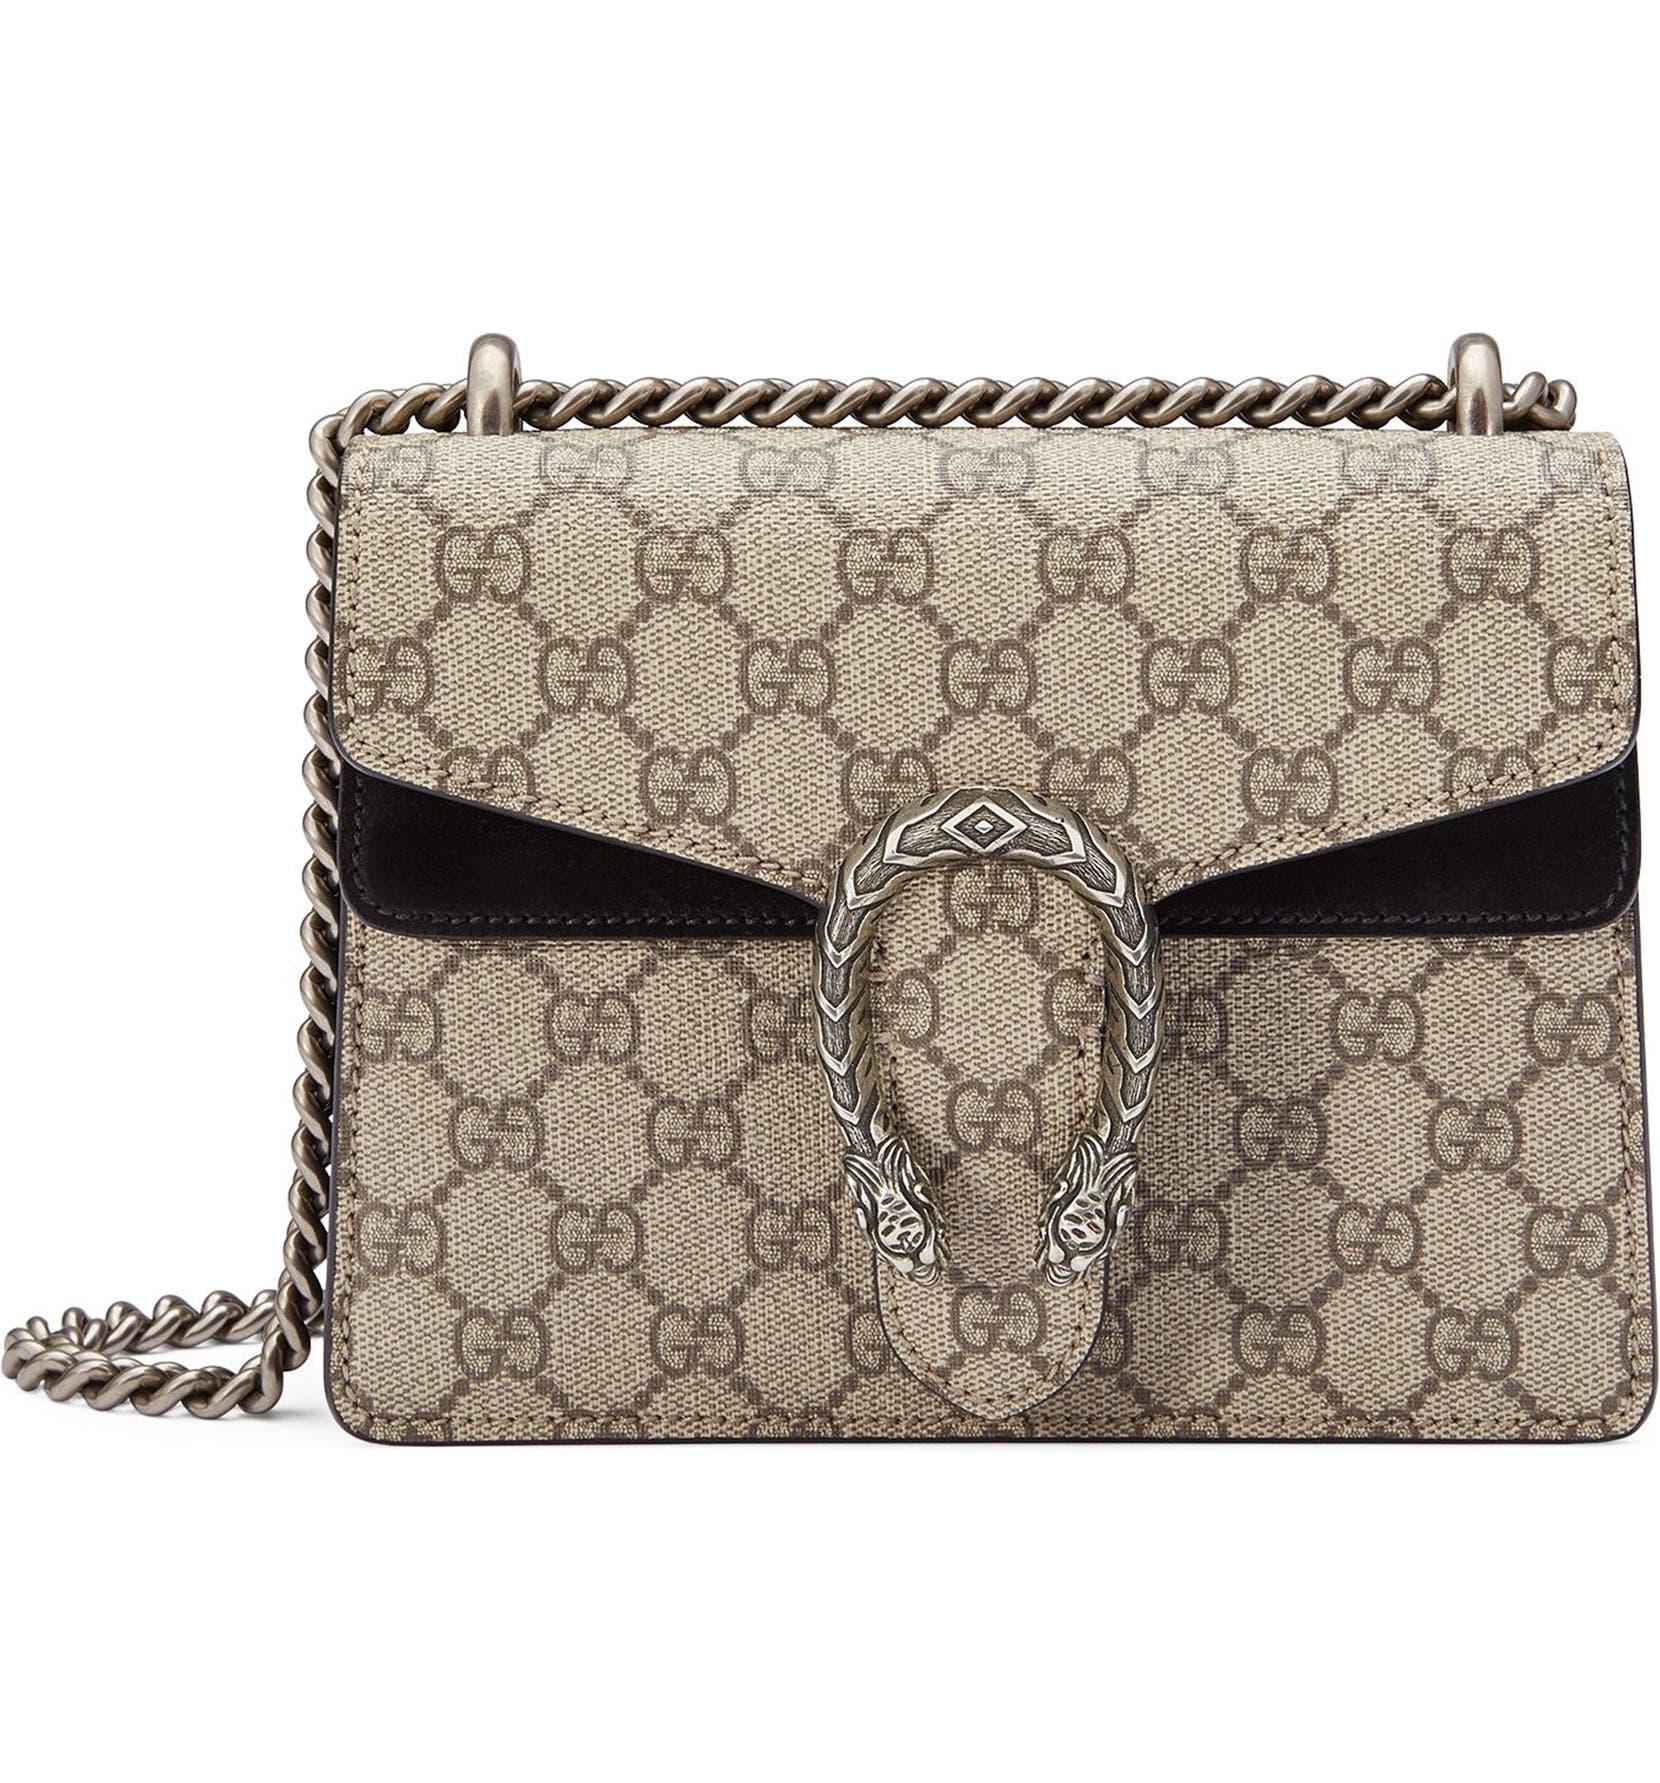 089bf7c191cc Gucci Mini Dionysus GG Supreme Shoulder Bag | Nordstrom